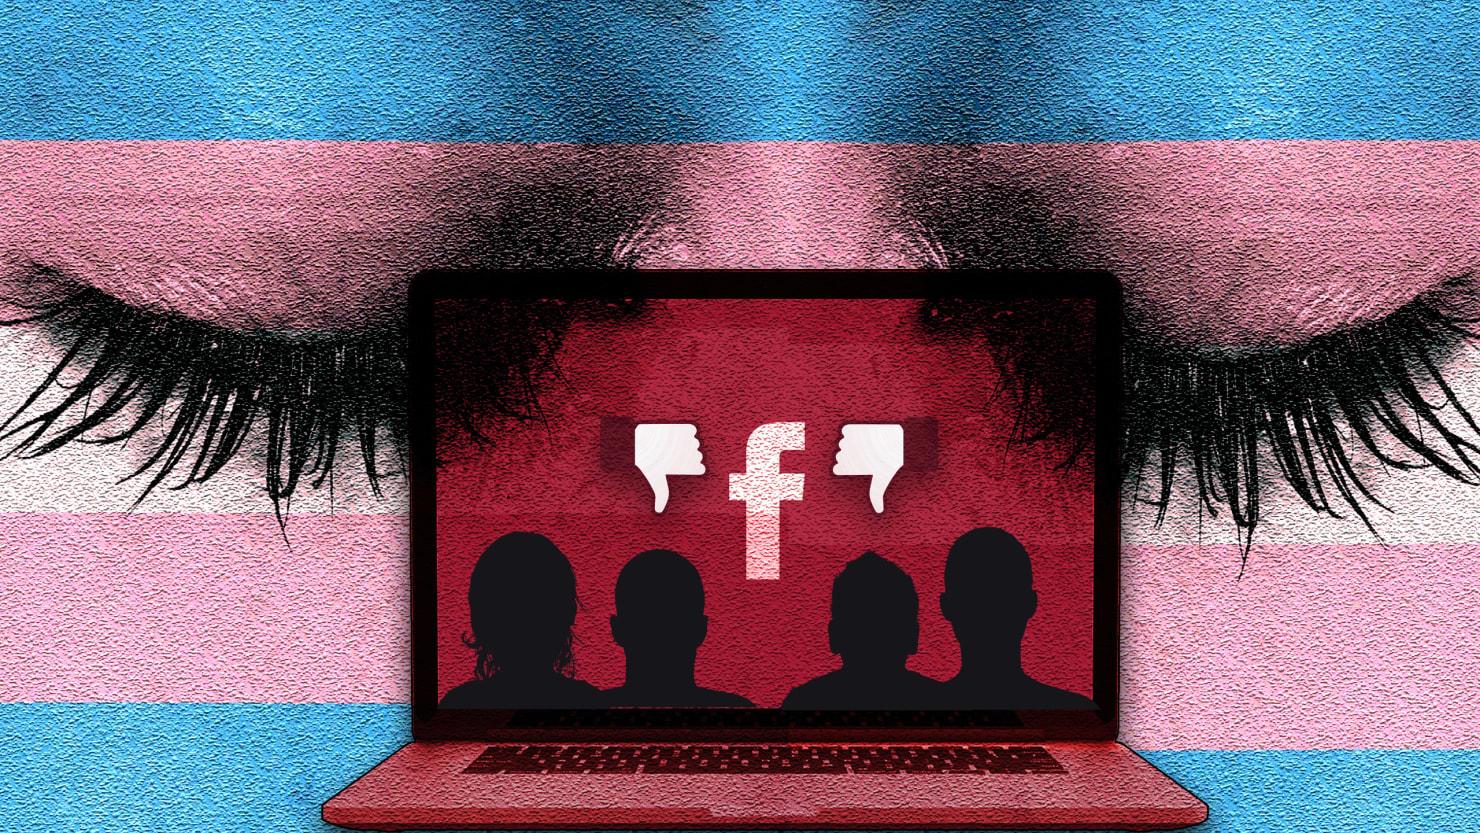 facebook u0027s pride rainbows don u0027t extend to trans people u0027s names